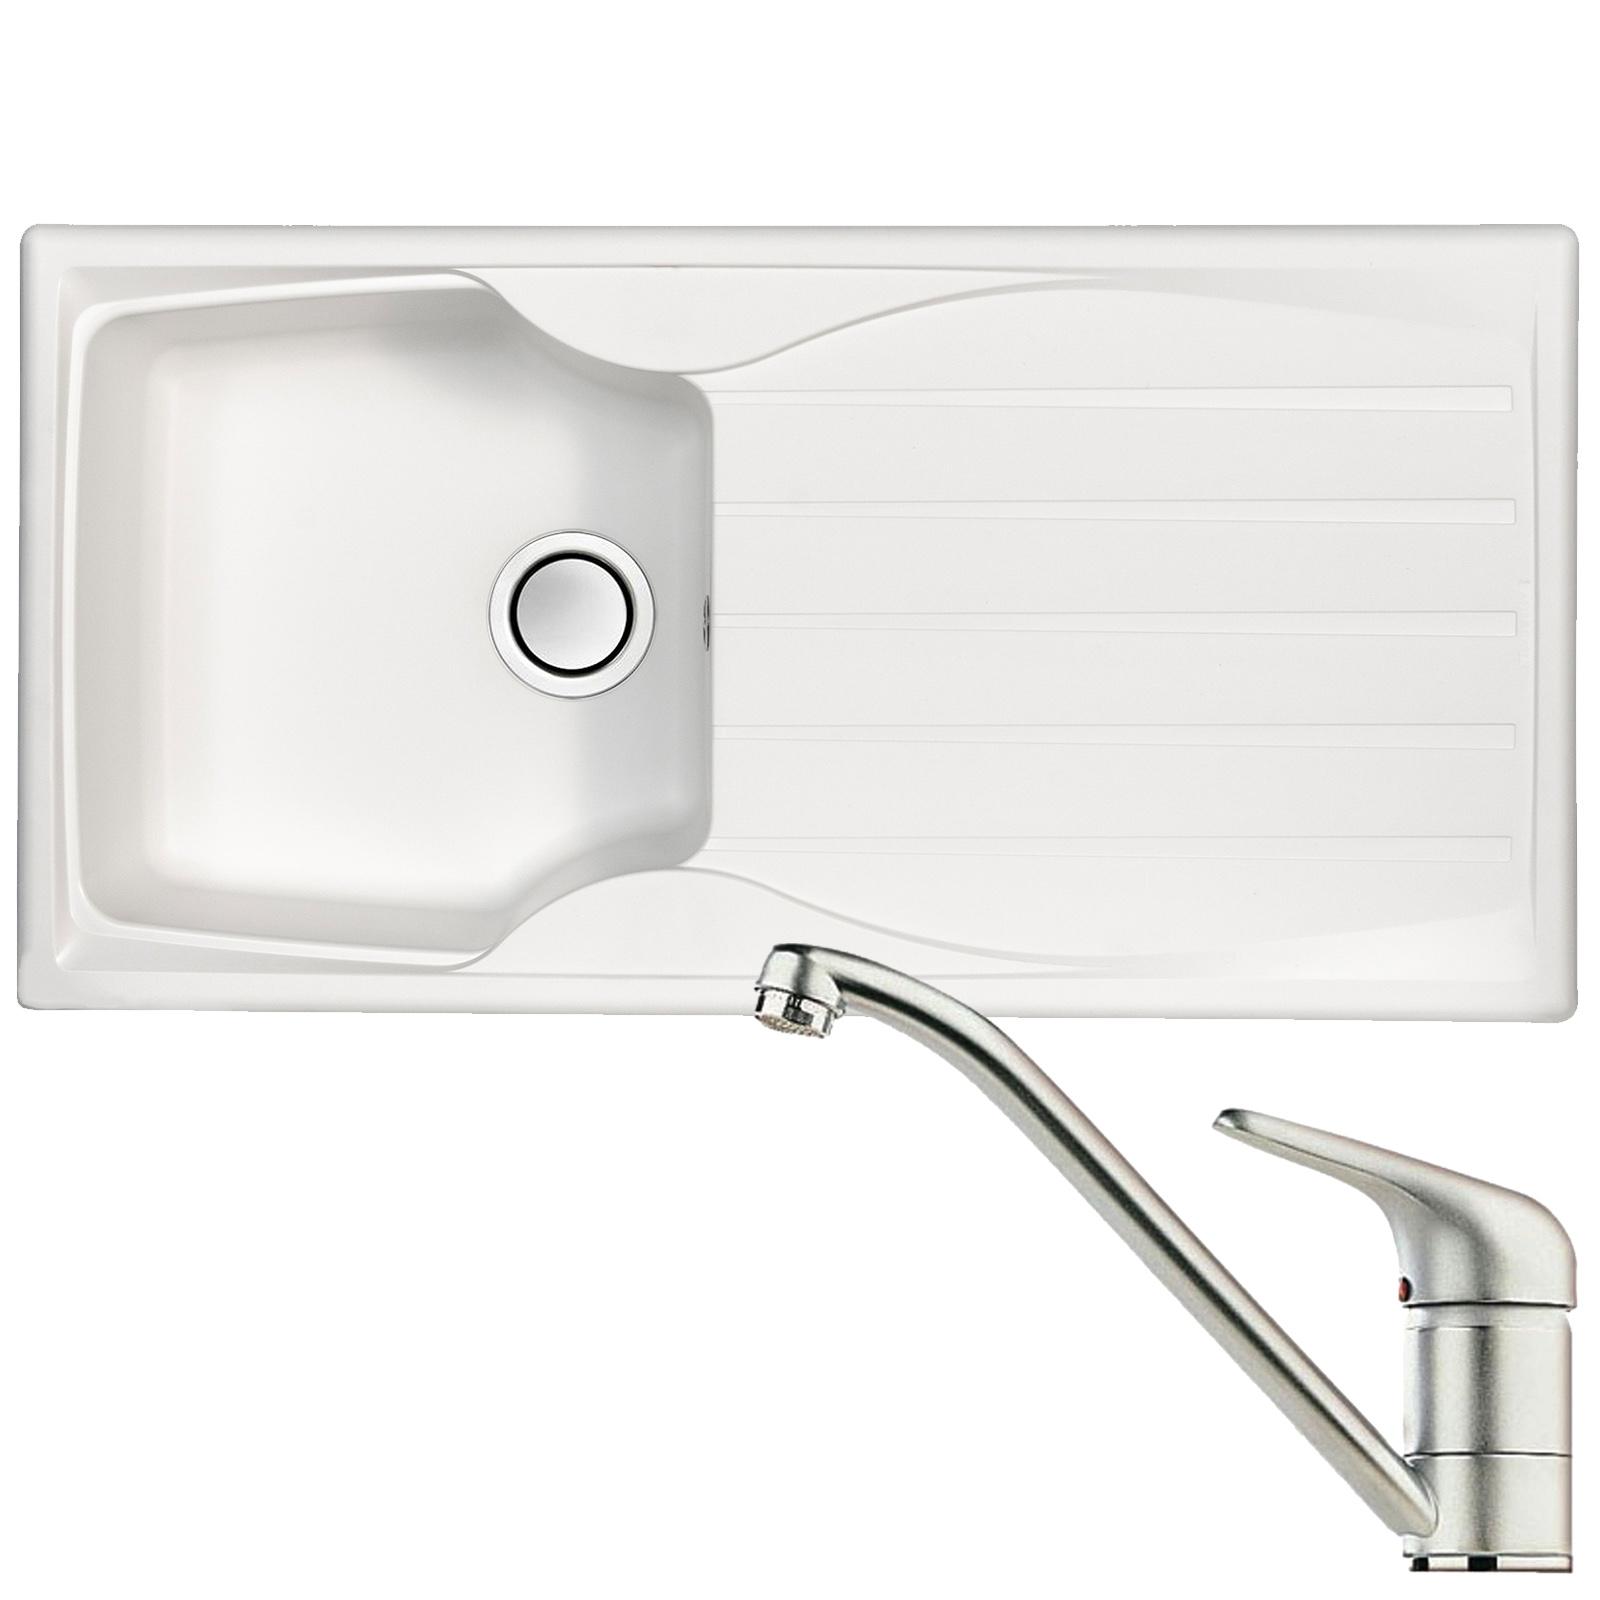 Astracast sierra 1 0 bowl white kitchen sink clearwater creta chrome mixer tap at ship it appliances